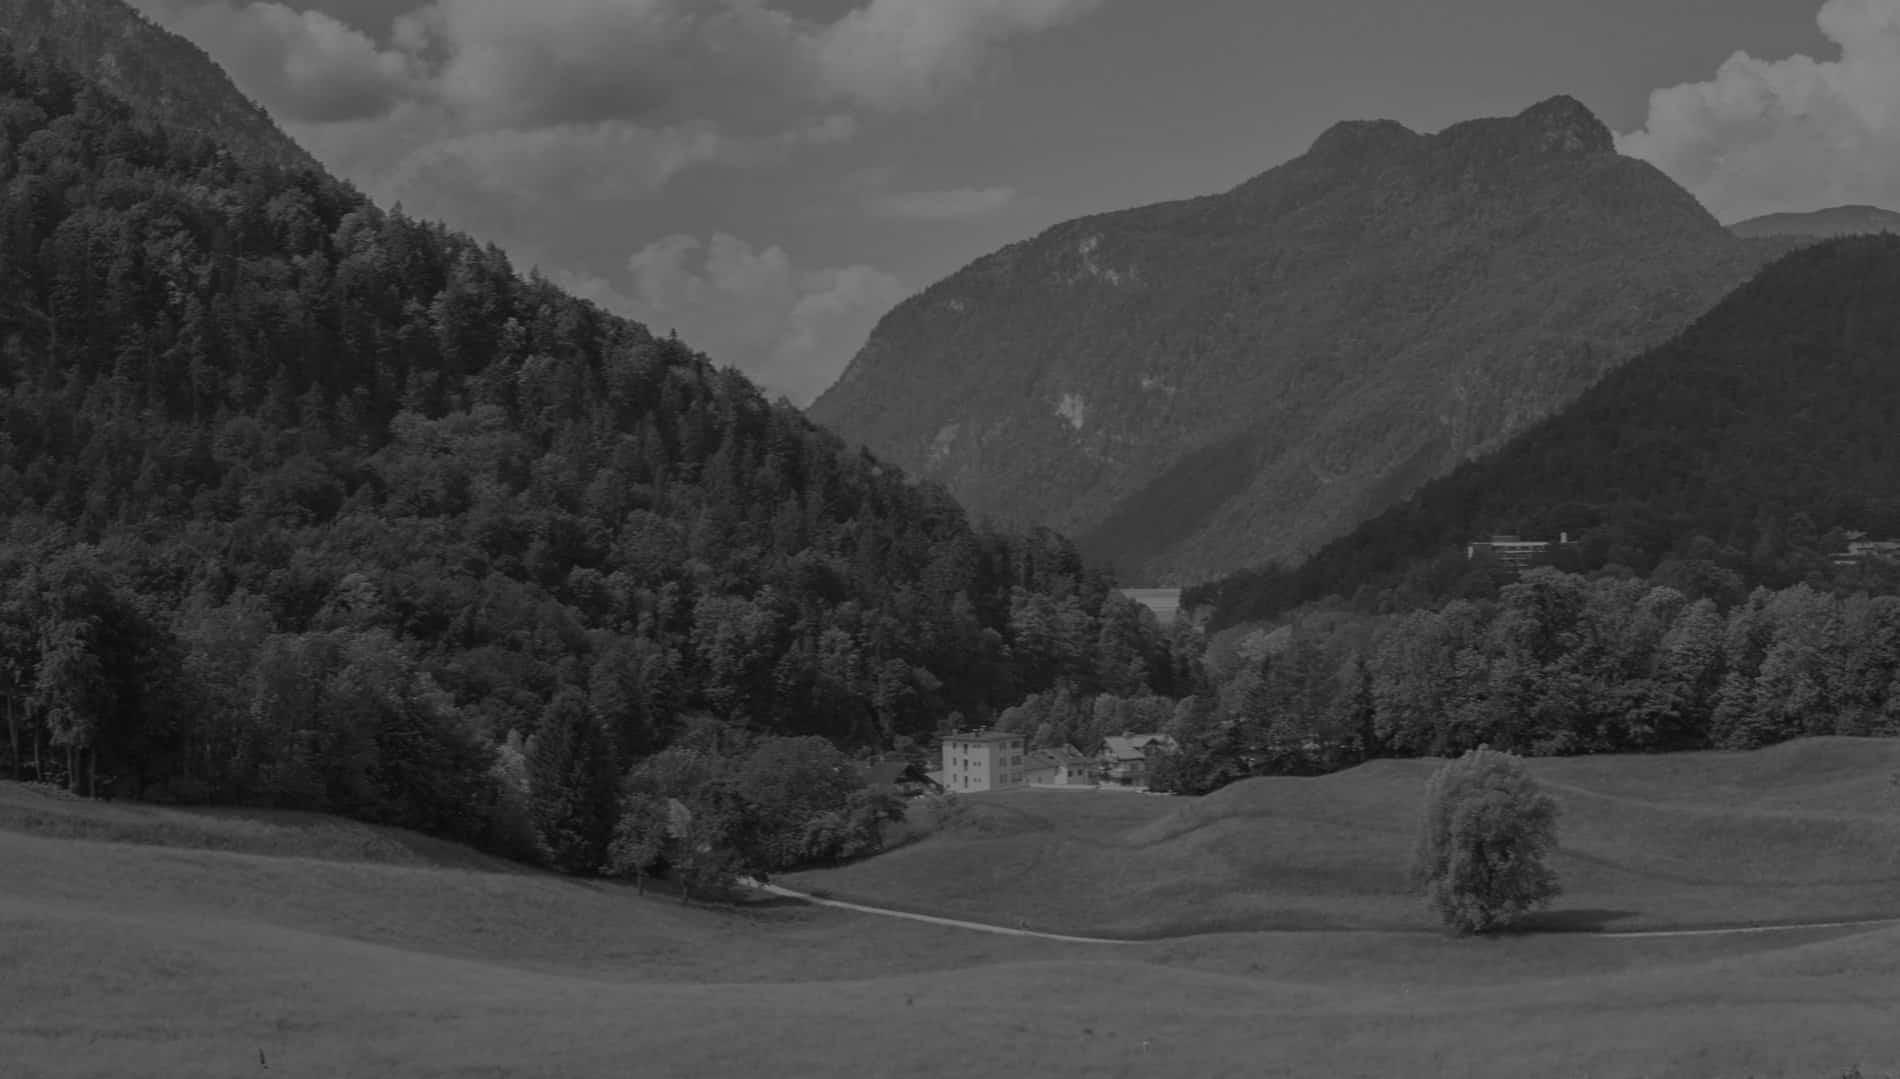 Grüne Landschaft, Hochplateau, nahe Bad Reichenhall, Panorama